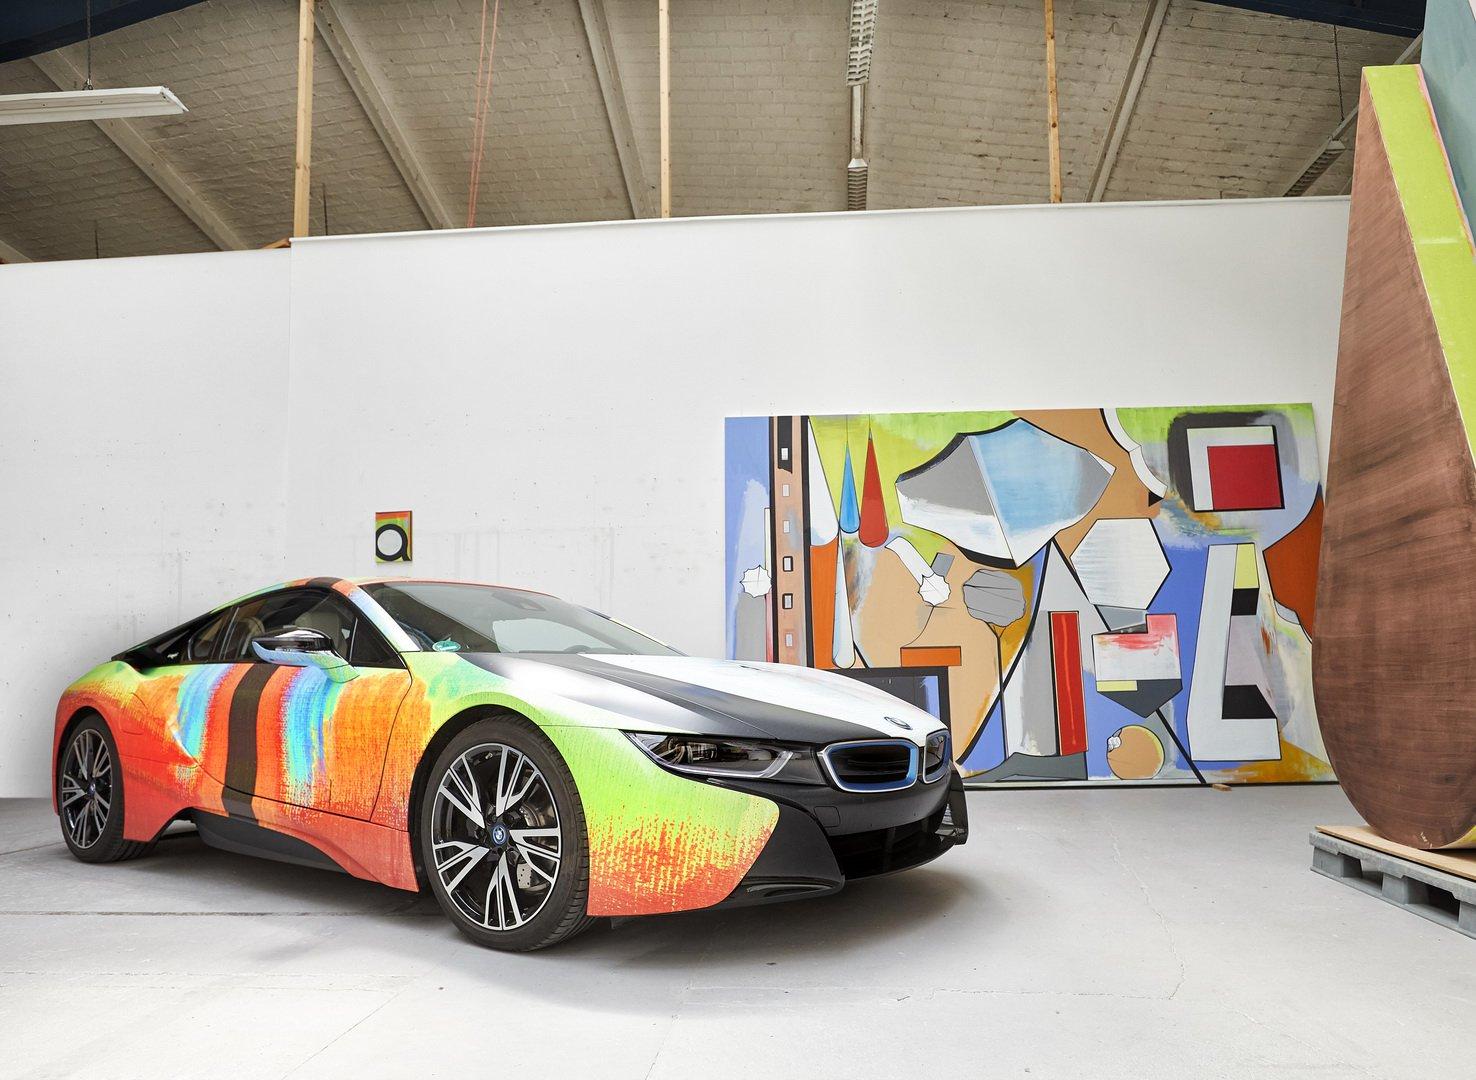 BMW-i8-car-art-5